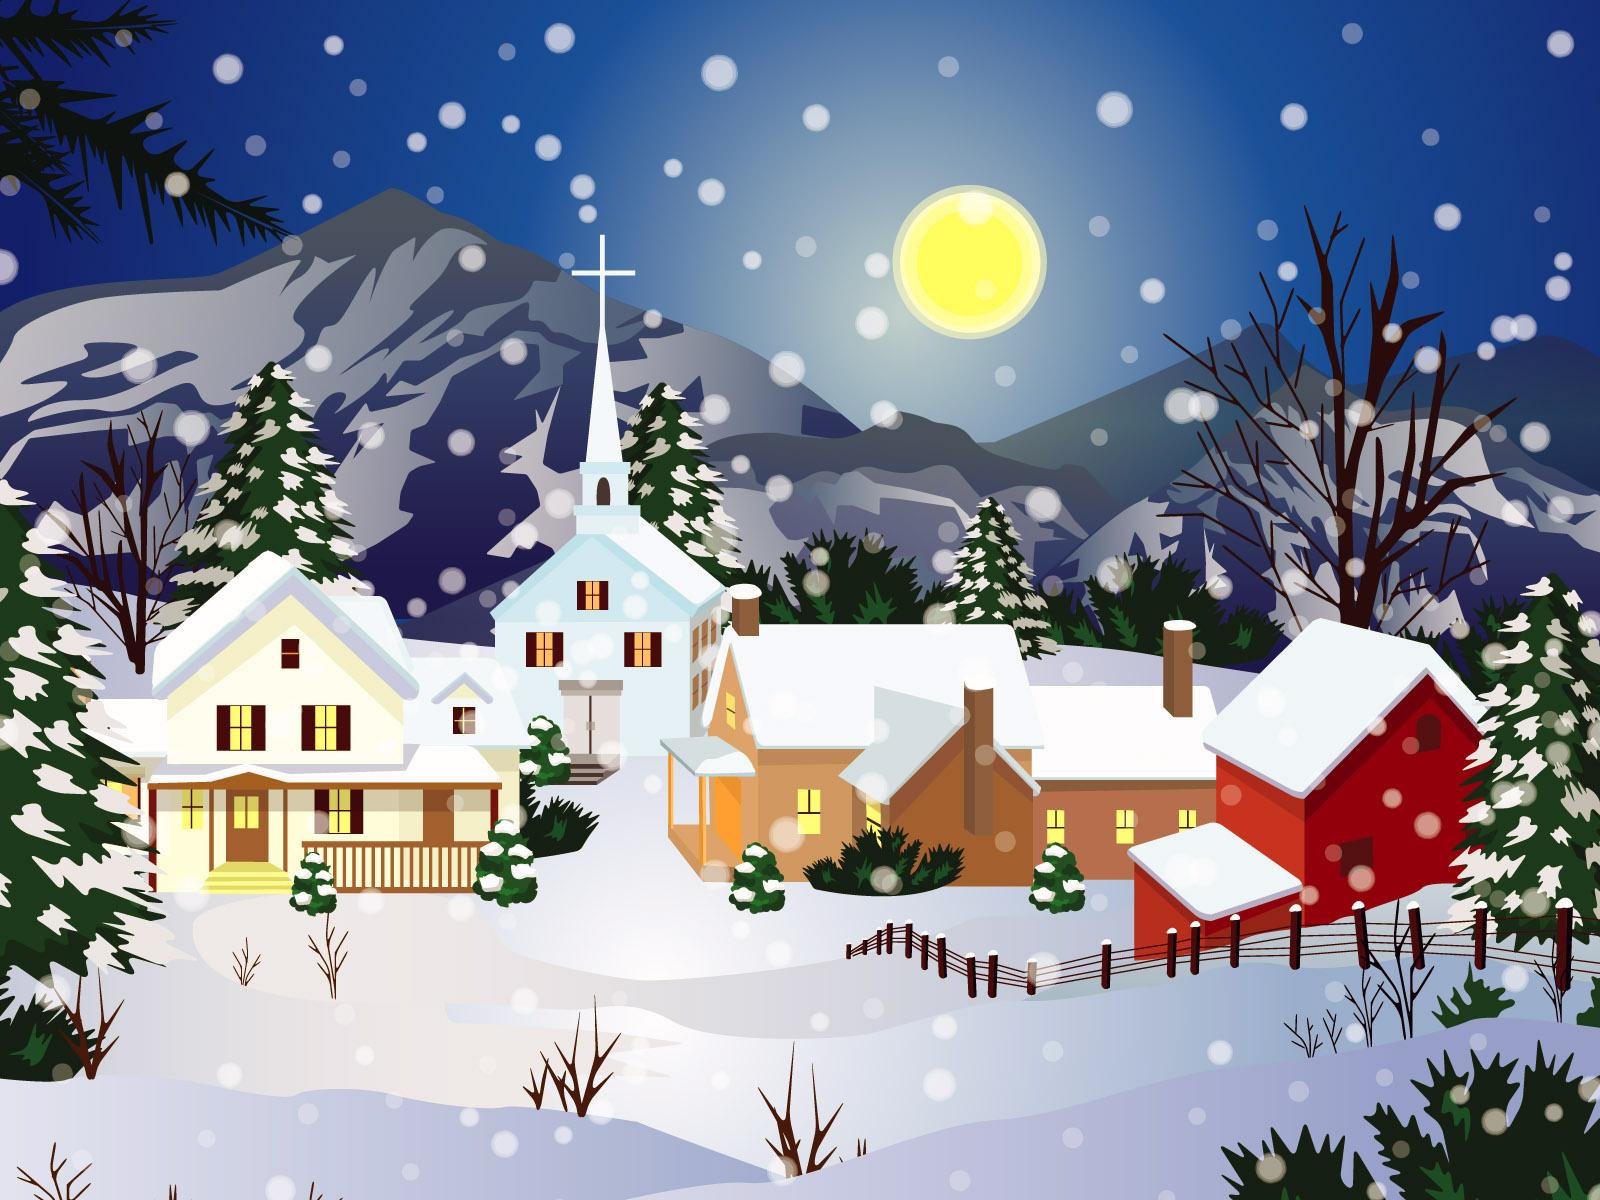 http://1.bp.blogspot.com/_5-iCrD3dHBc/SwbEmMK4flI/AAAAAAAAADs/MMToUuTOlw8/s1600/Peisaje+de+Craciun+Desene+Animate+Pentru+Cei+Mici.jpg